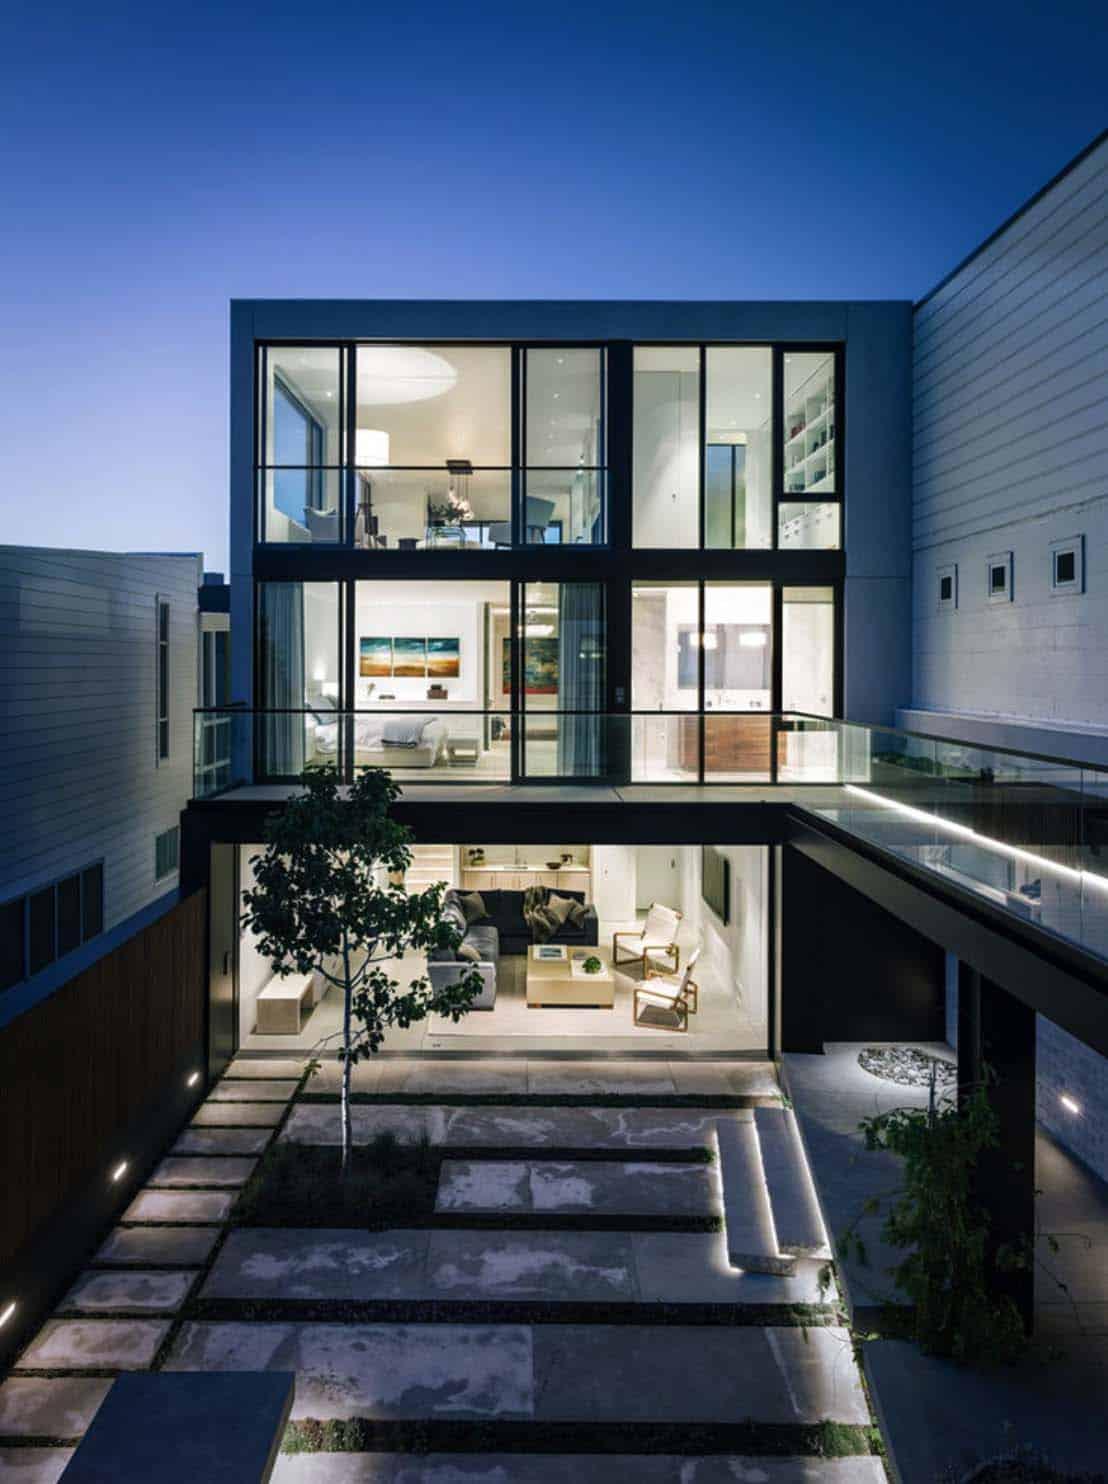 Mid-Century Modern Home-John Maniscalco Architecture-34-1 Kindesign